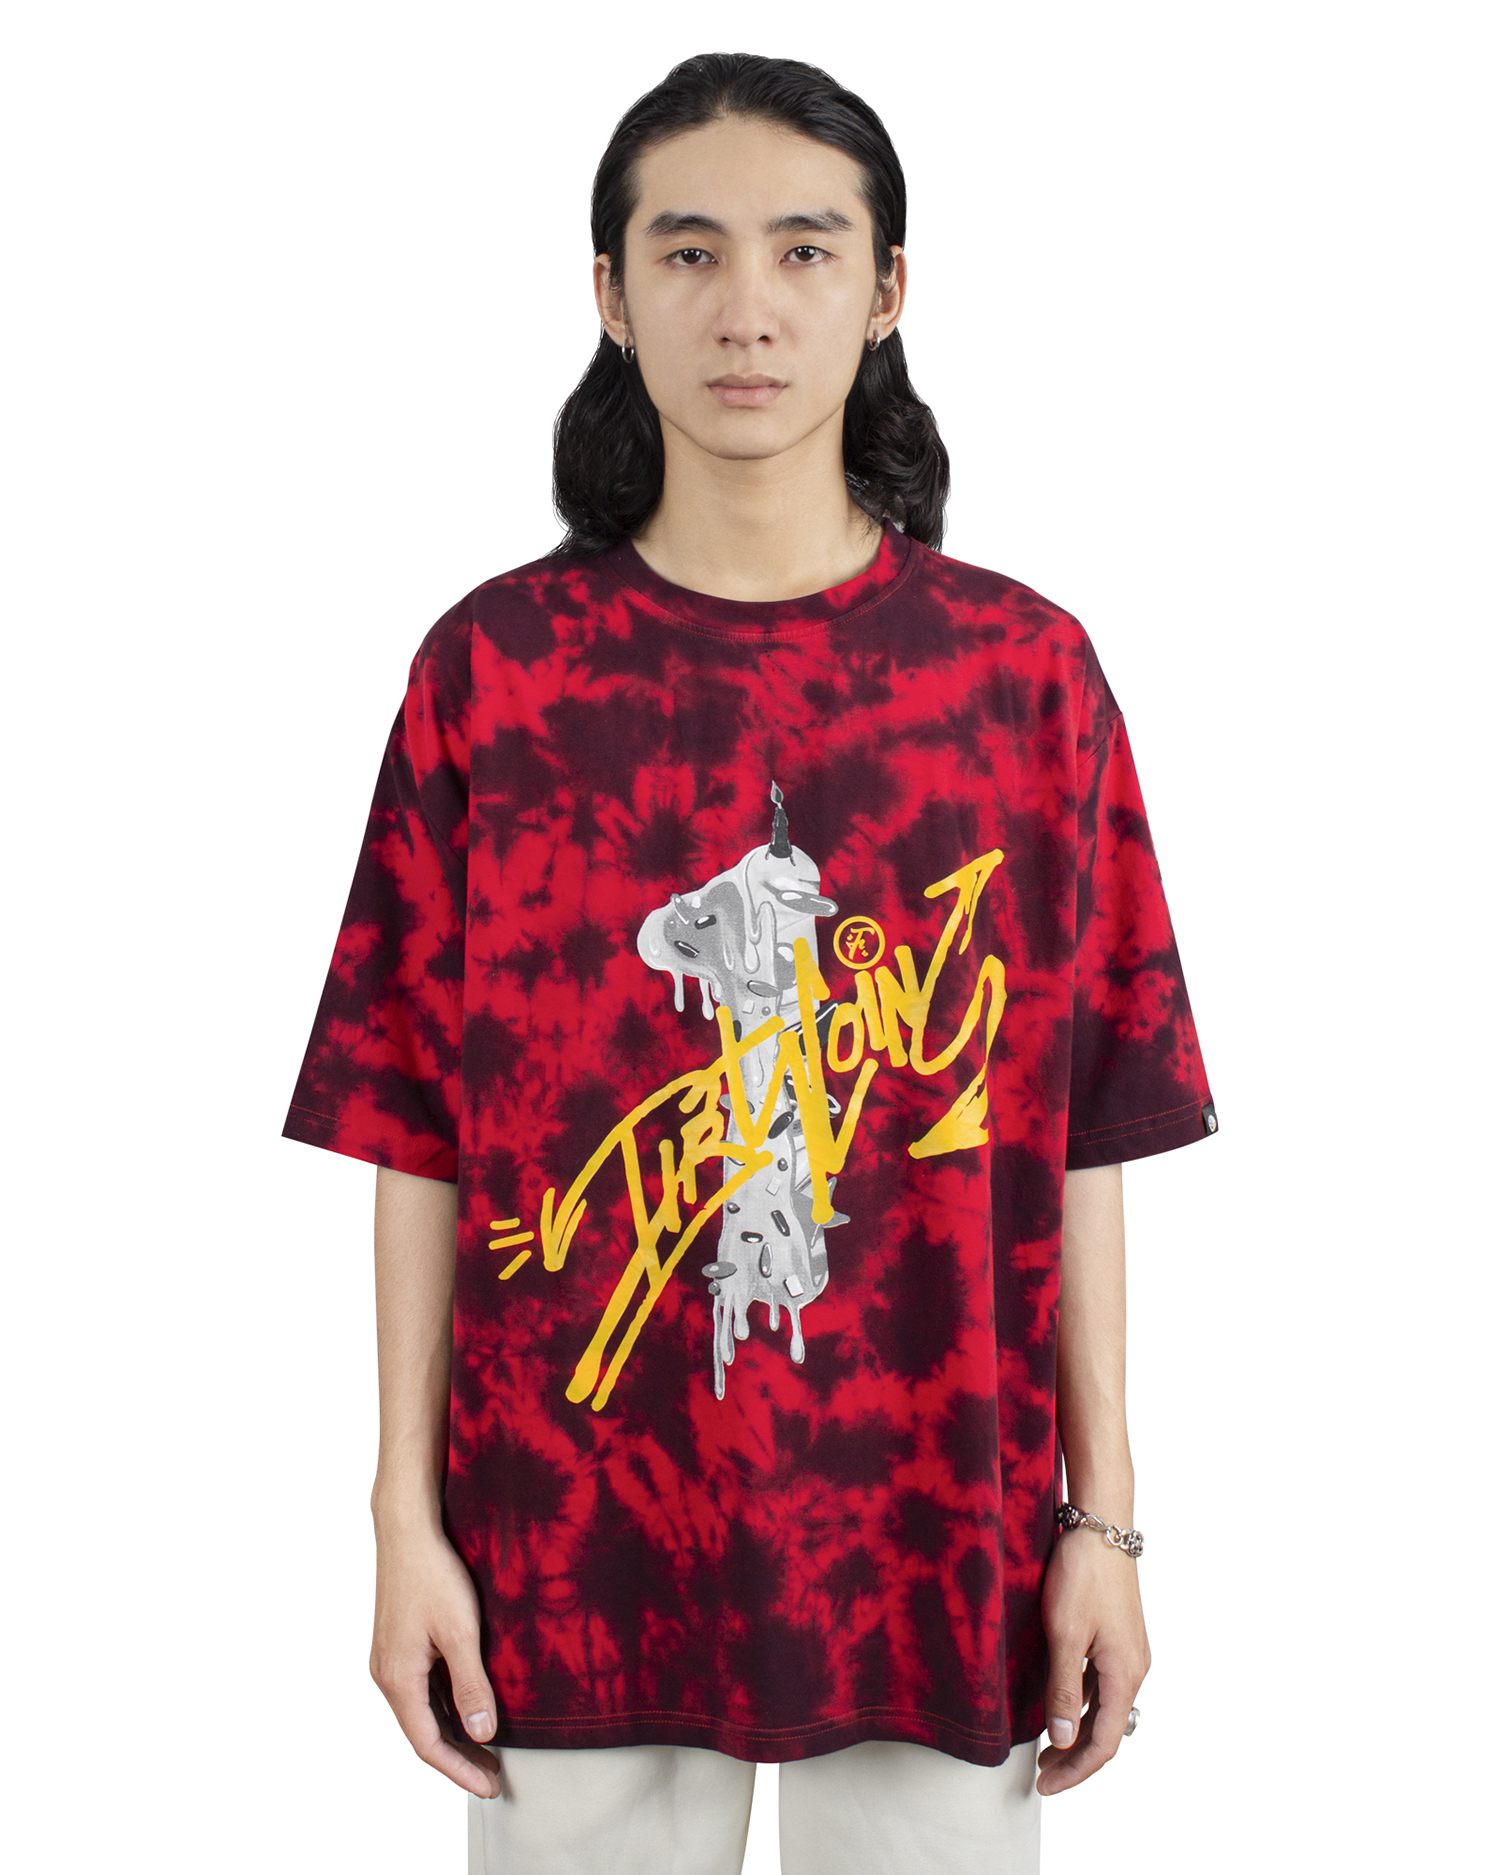 1M - FBDC T-Shirt